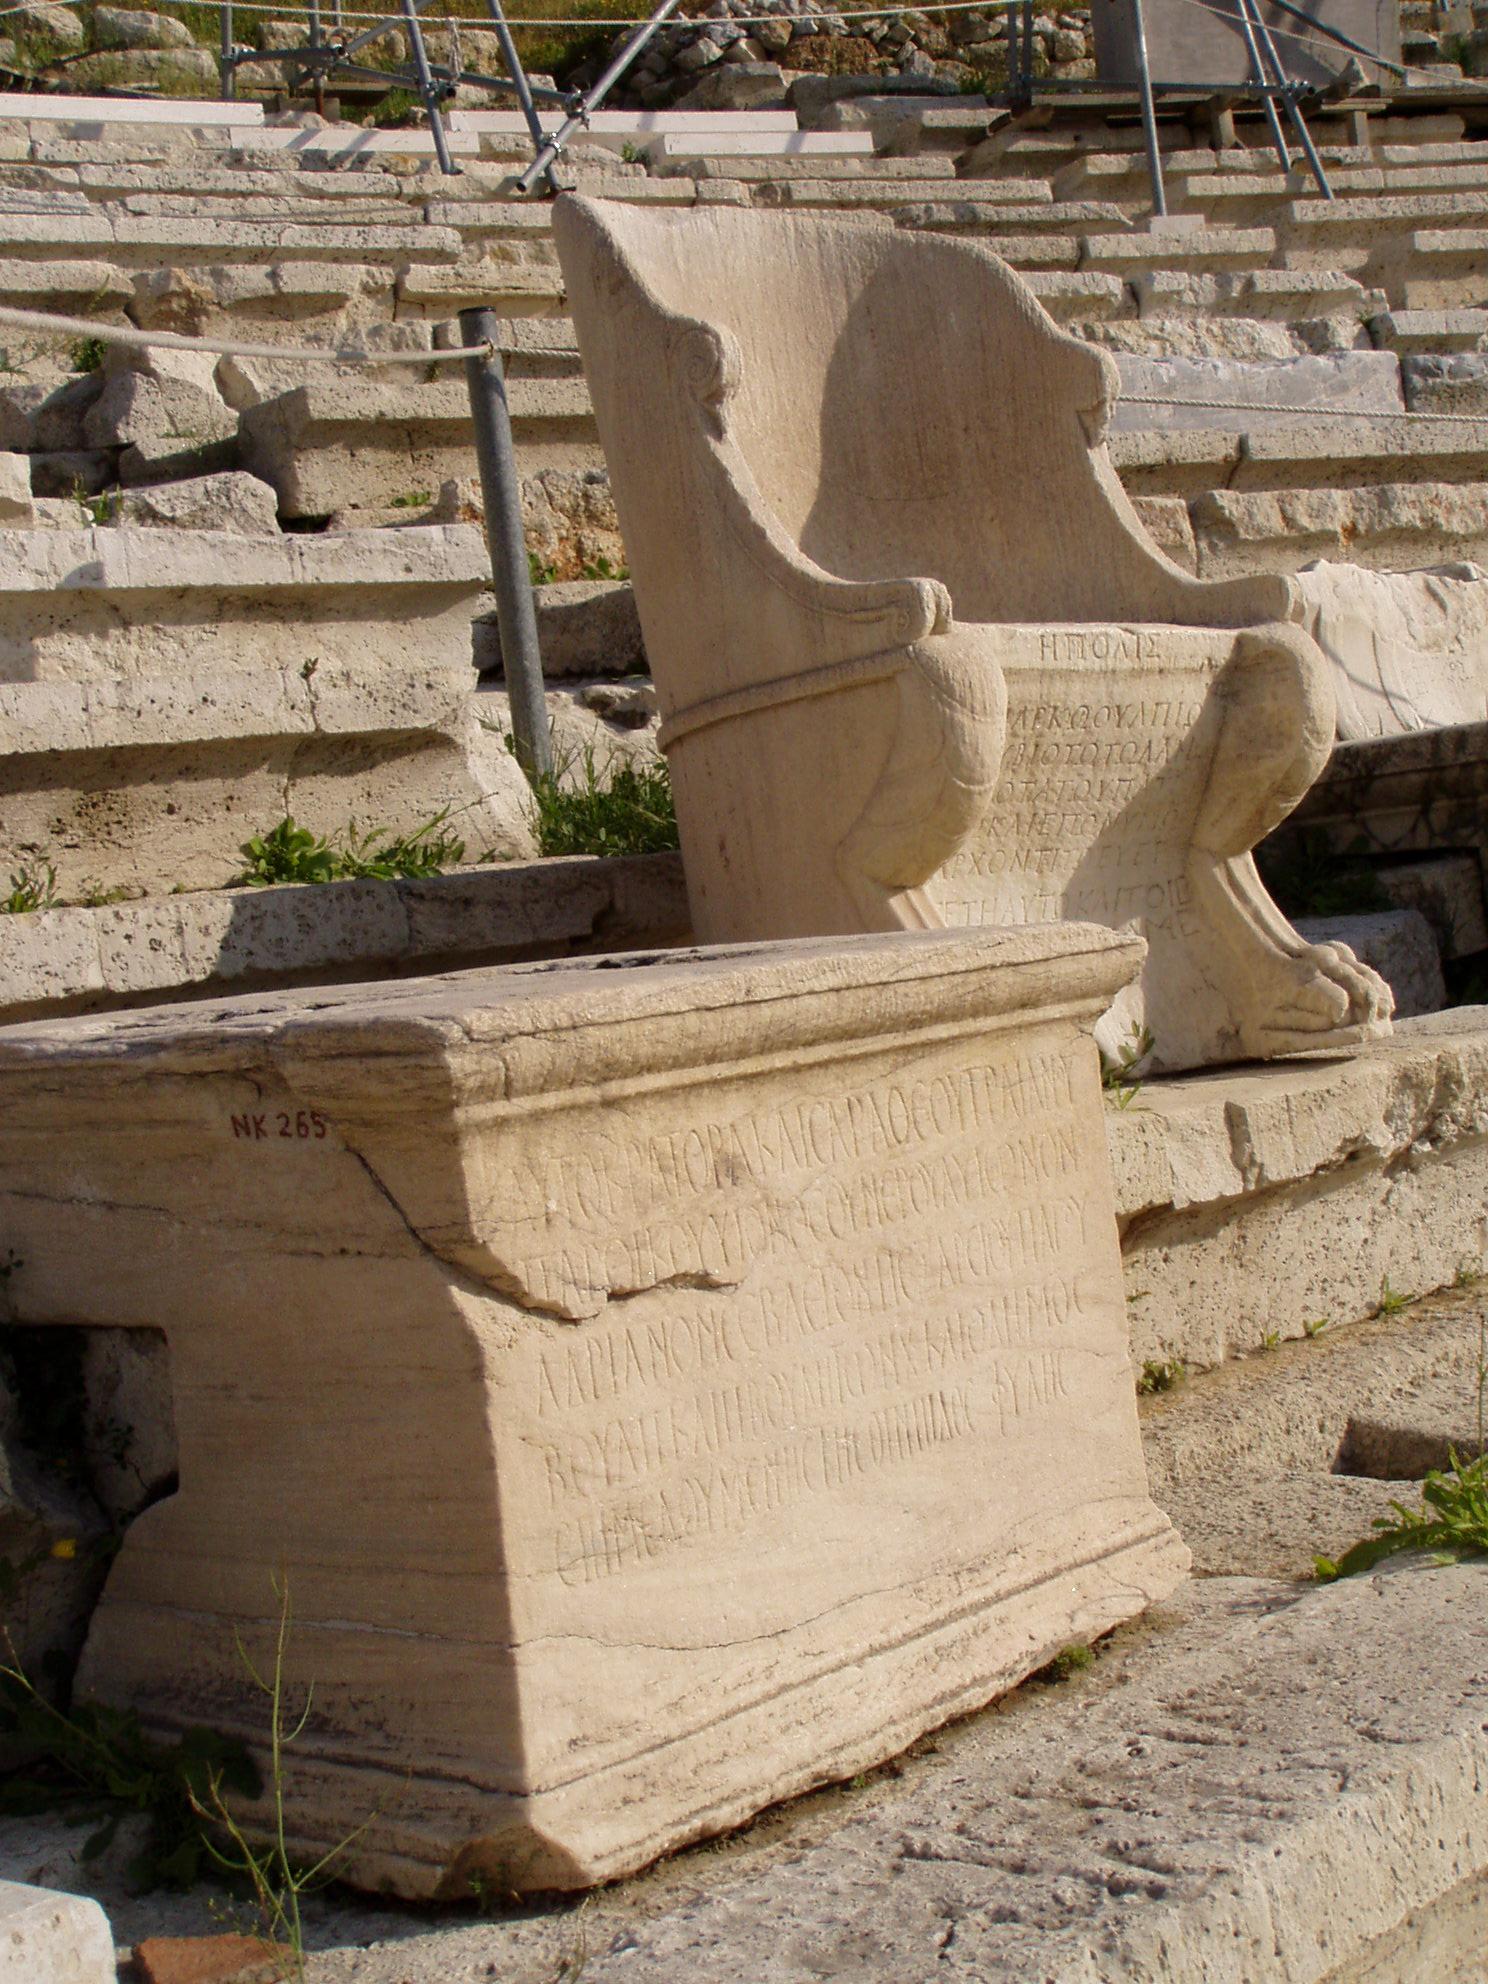 http://upload.wikimedia.org/wikipedia/commons/b/b2/Ehrentribuene_Dionysostheater_Athen.jpg